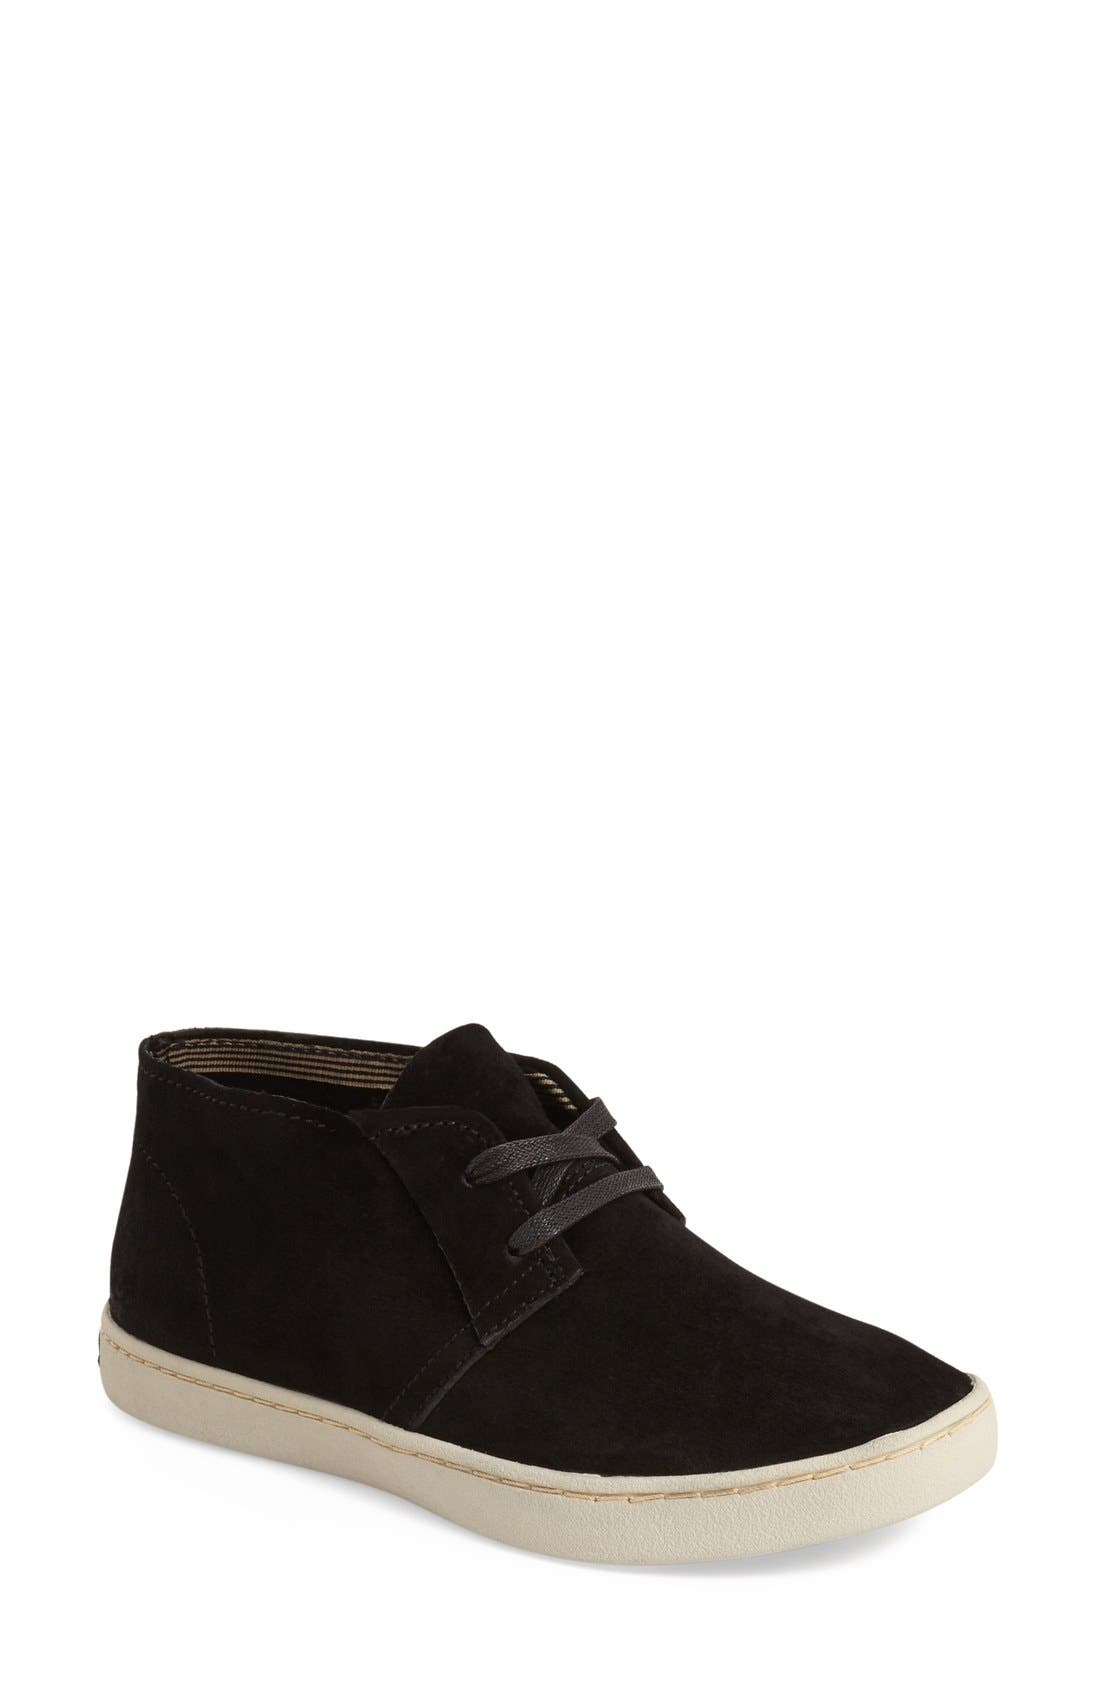 'Cille Gwen' Sneaker,                             Main thumbnail 1, color,